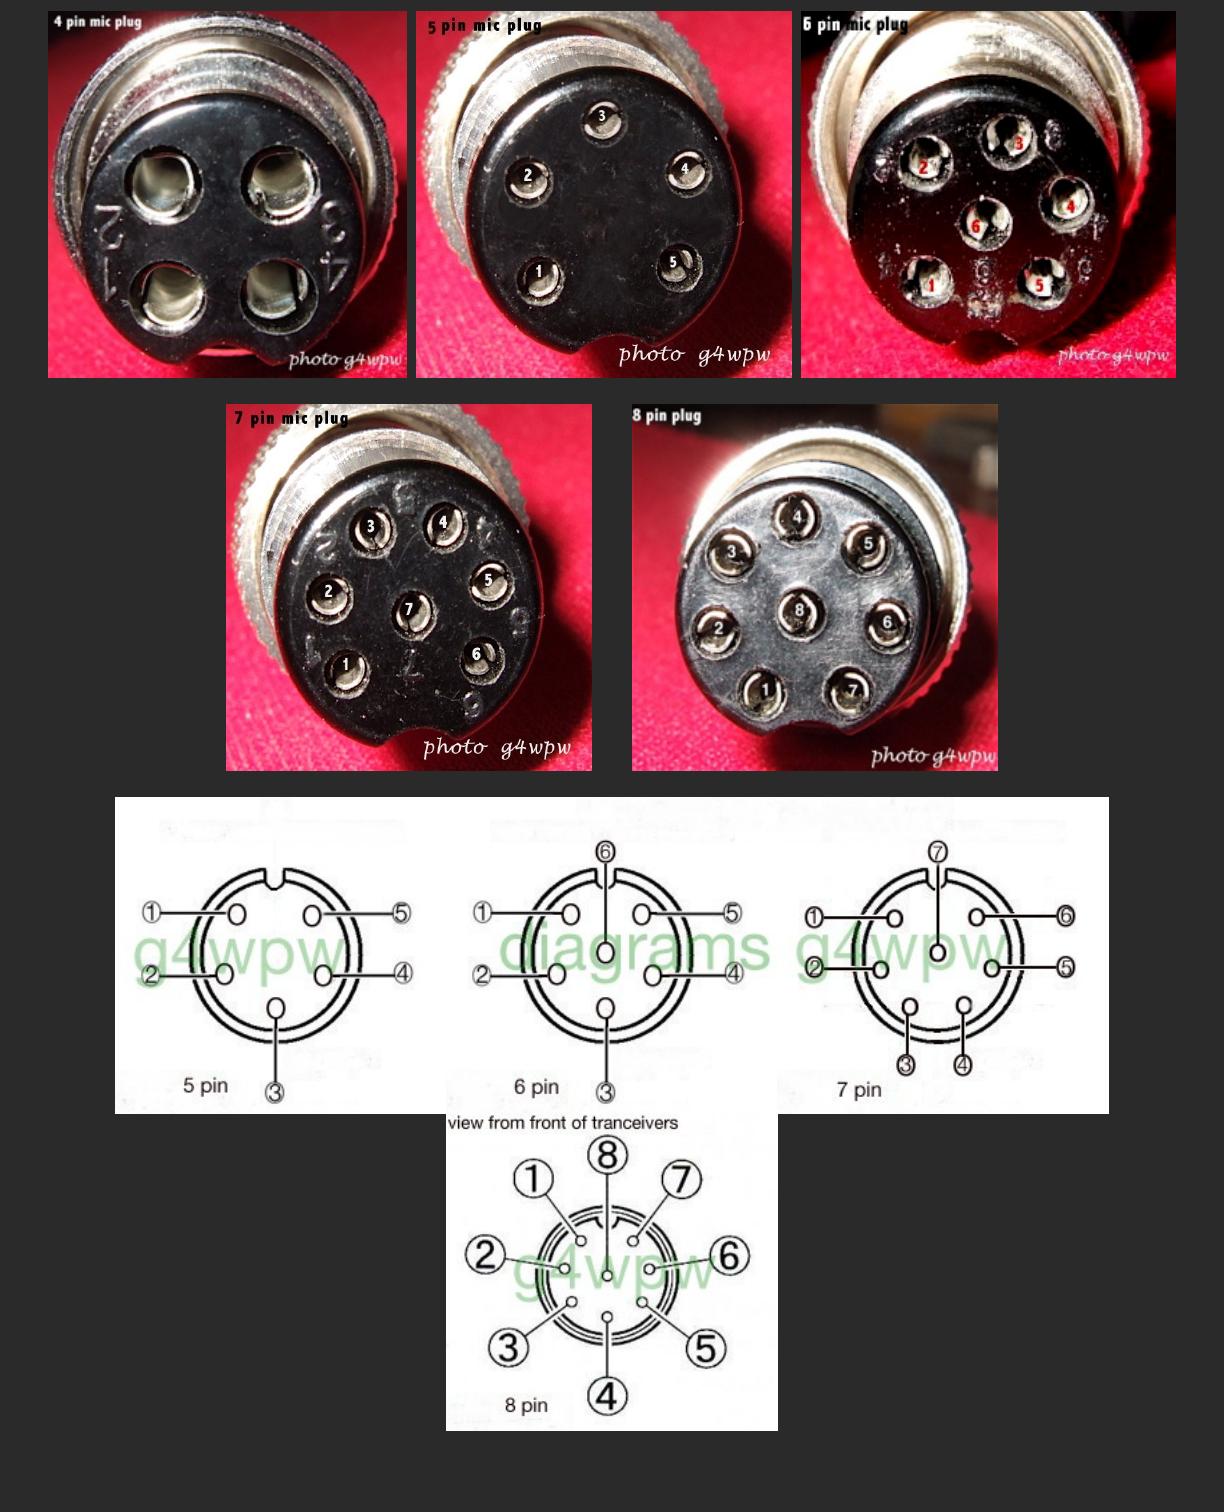 Date Tr2300 Microfones Ligacoes Condenser Microphone Schematic For The Yaesu Mh31